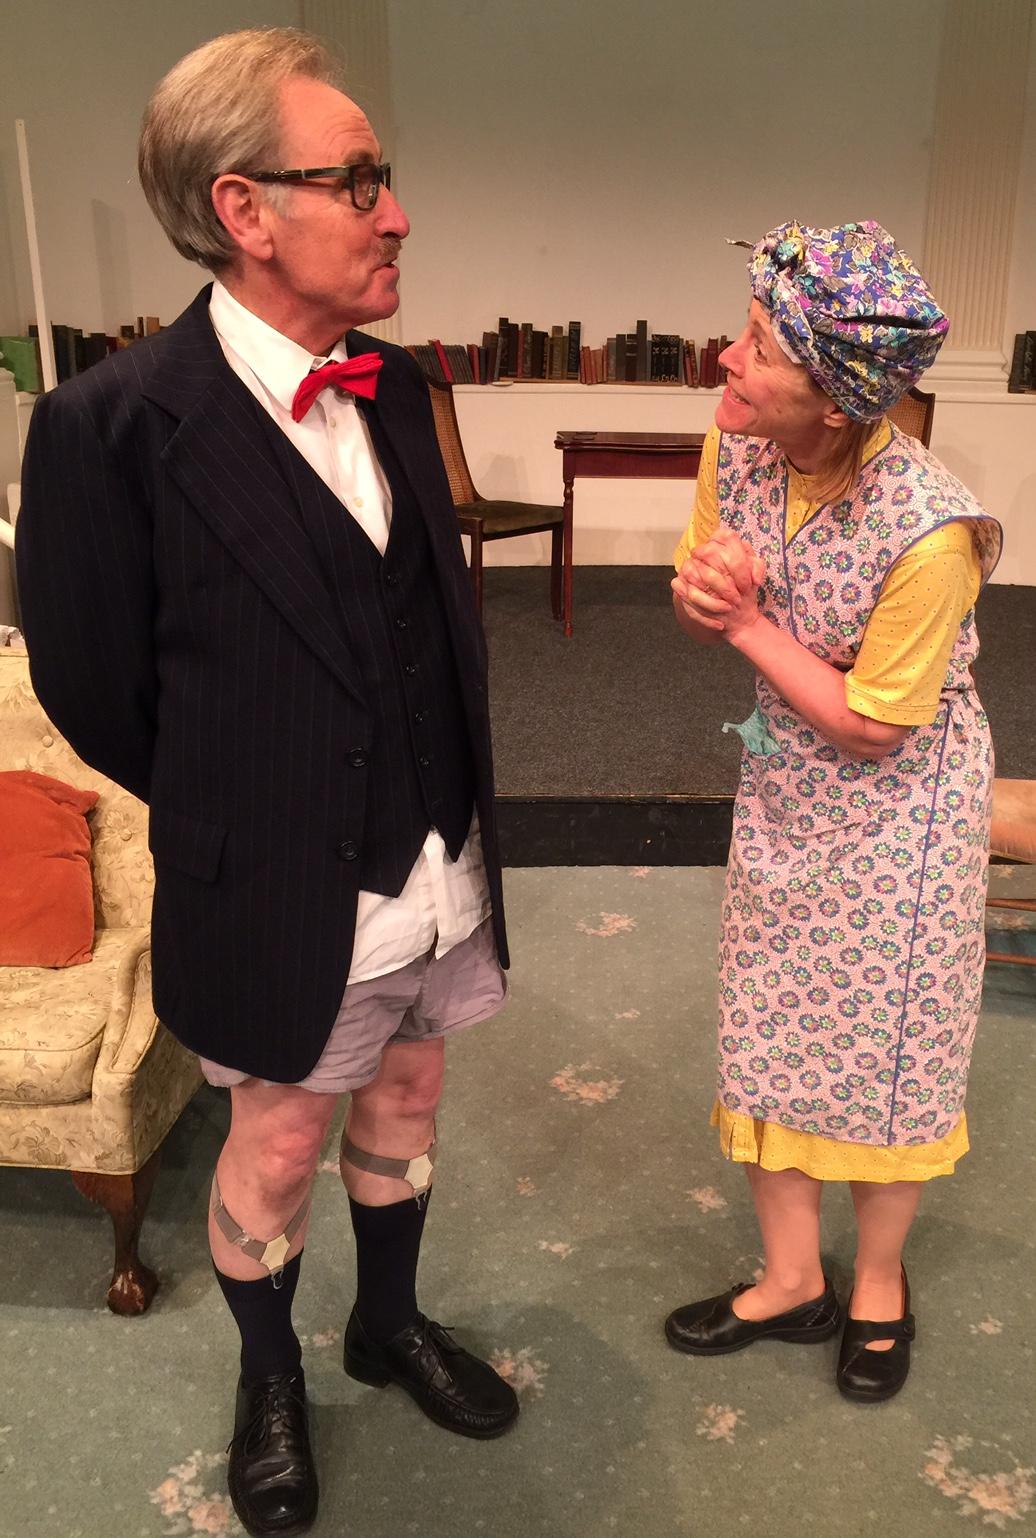 John Matthews - Sir Percy Shorter, Caroline Groom - Mrs Swabb.jpg